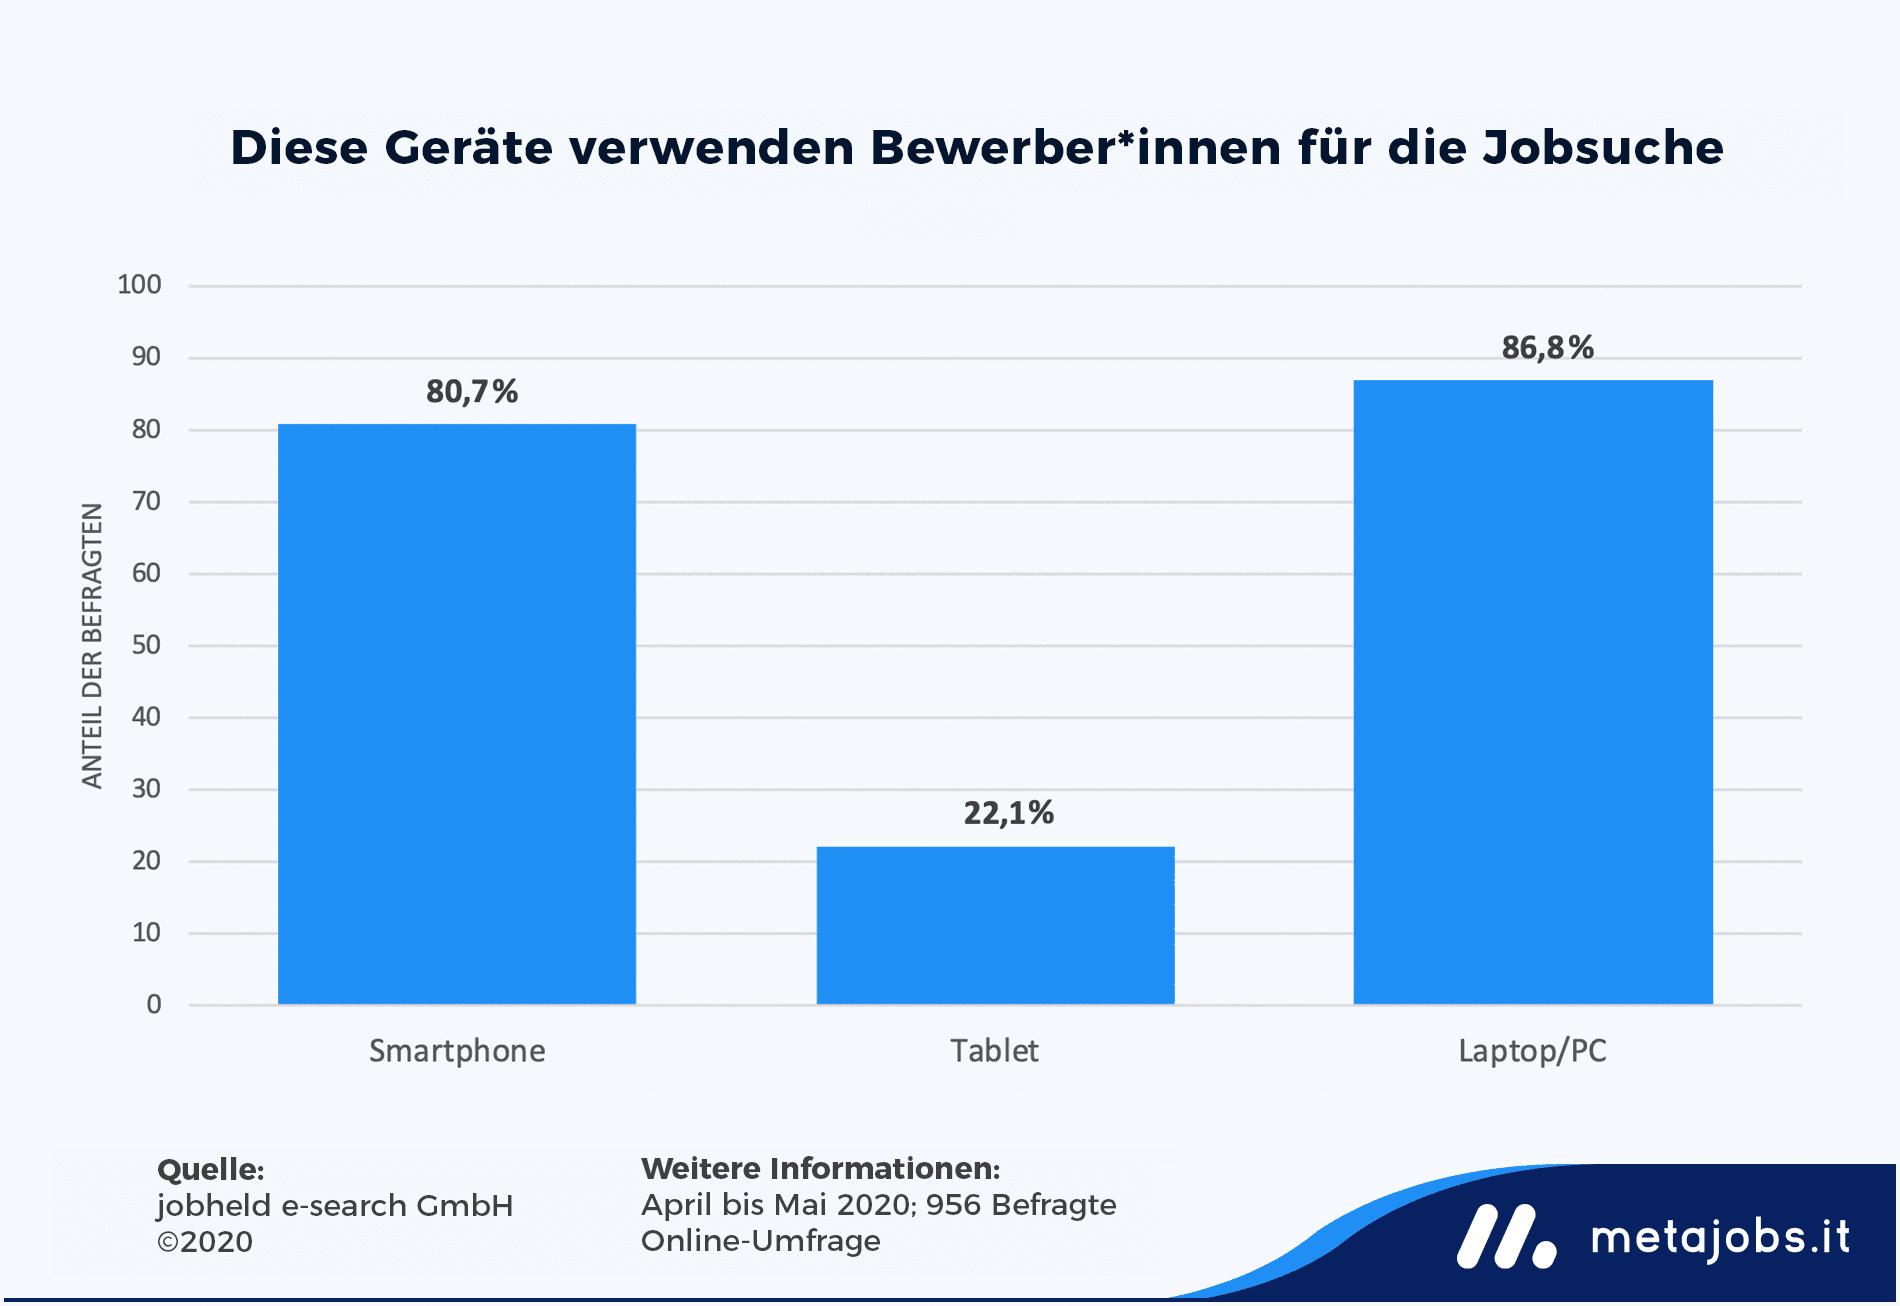 Infografik: Jobsuche im Internet nach Endgerät   metajobs.it